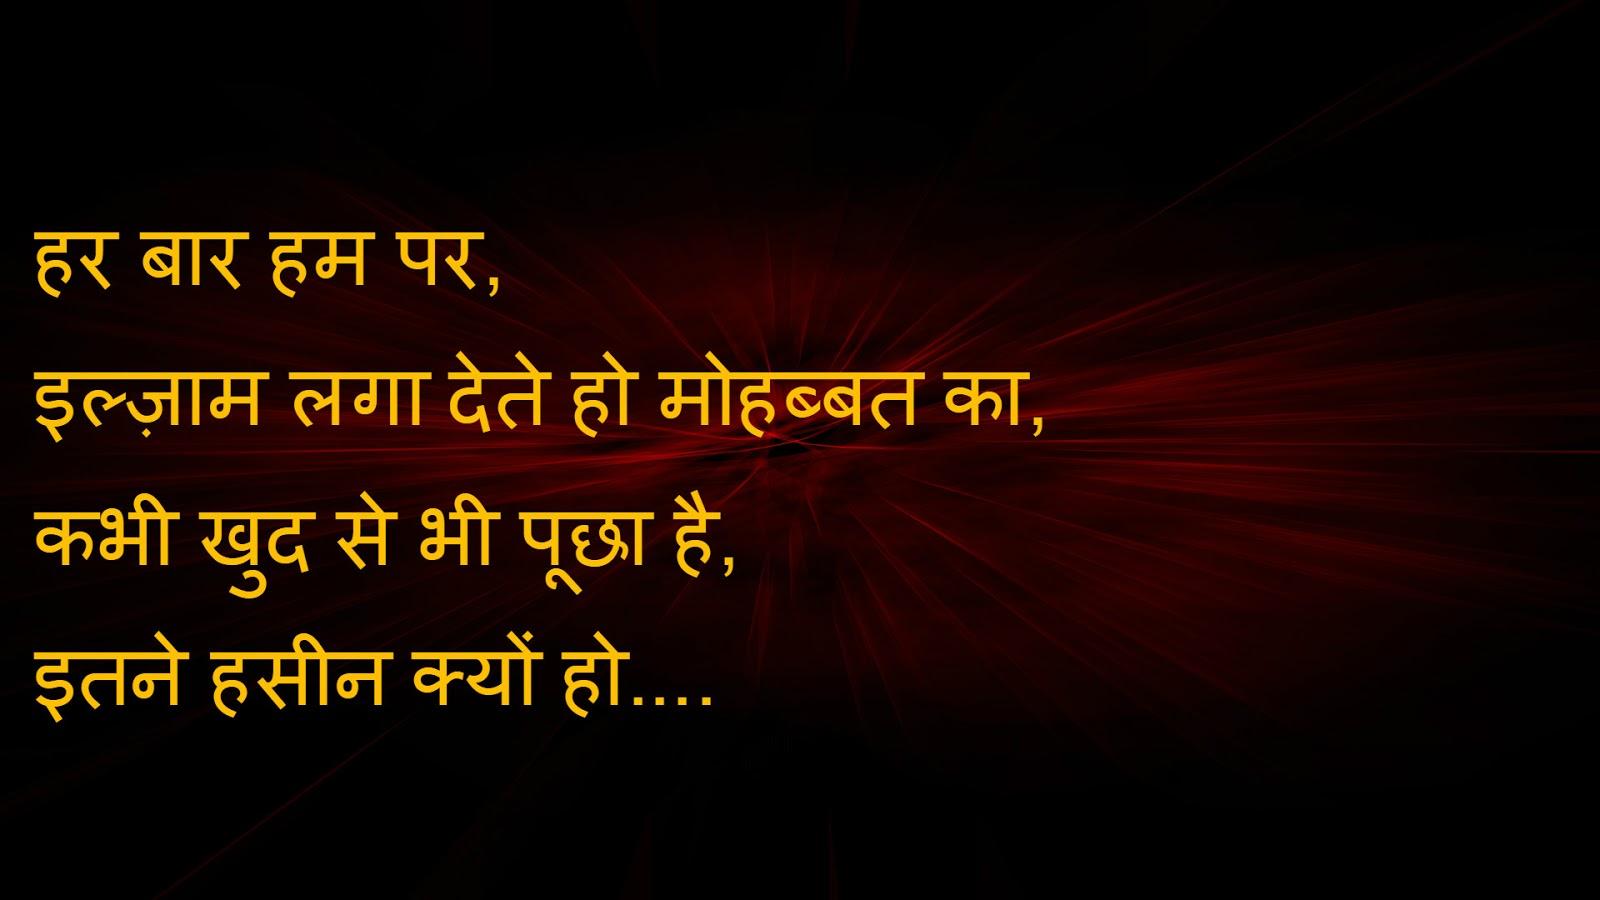 Wallpaper download jokes - Top30 Hindi Joke Shayari Dosti In English Love Romantic Image Sms Photos Pics Wallpapers